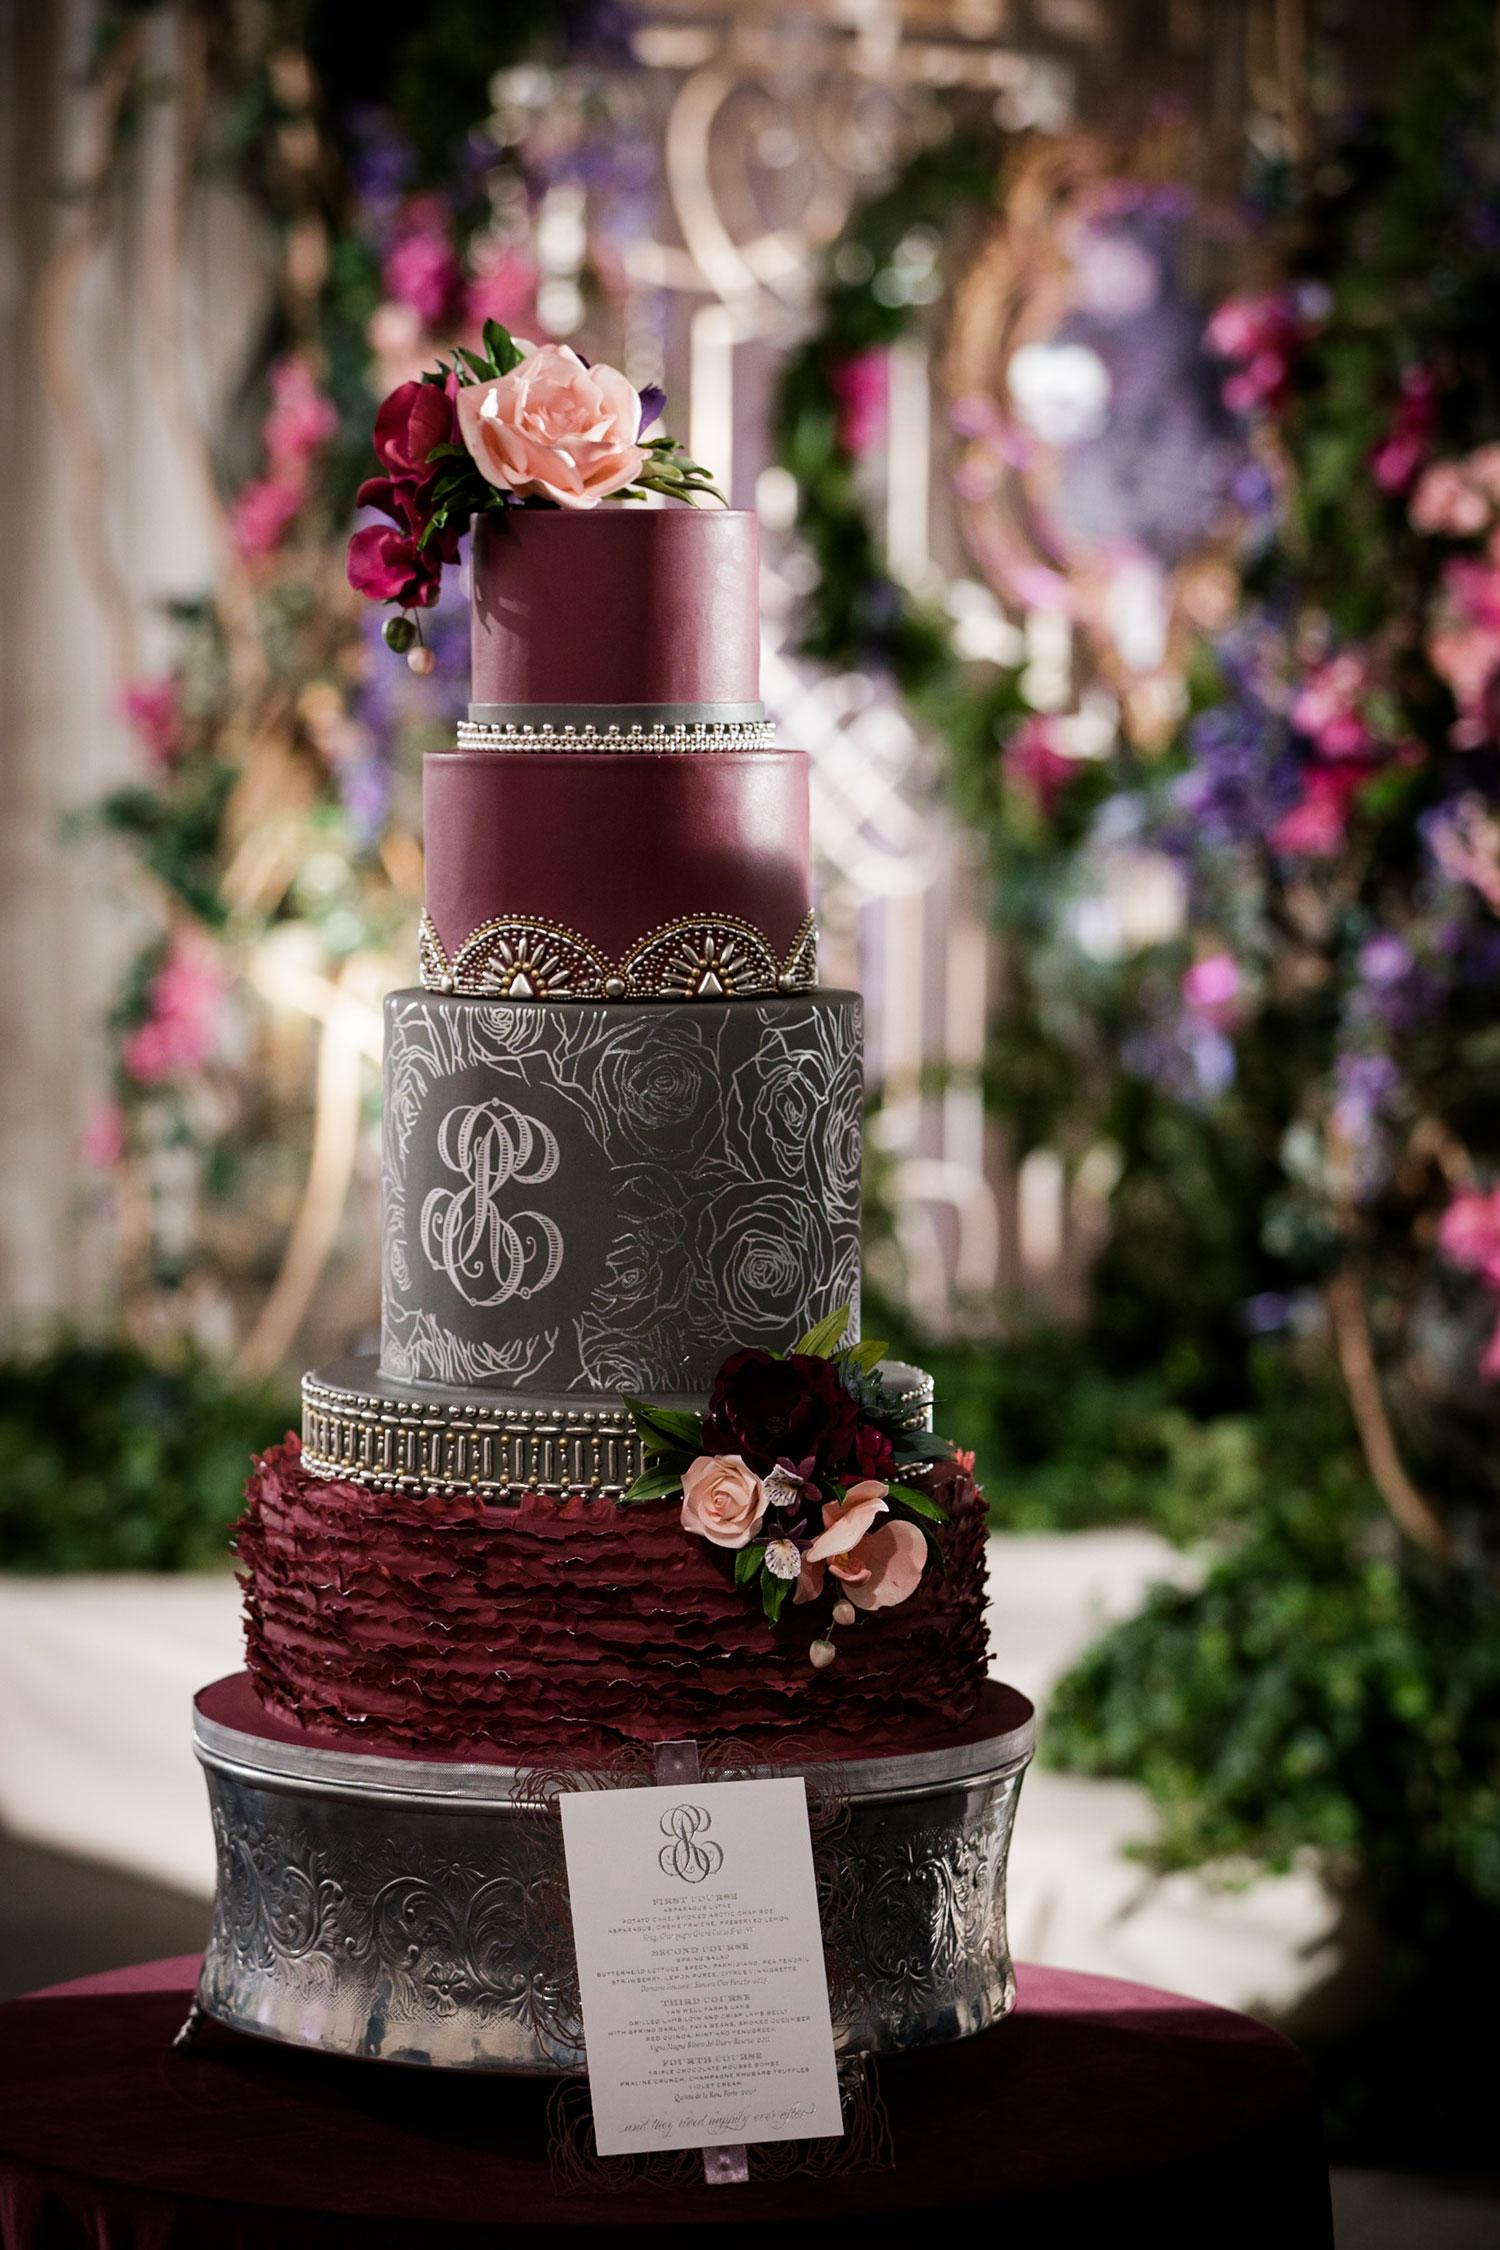 Alternative wedding cake idea dark colors metallic ruffle fondant details